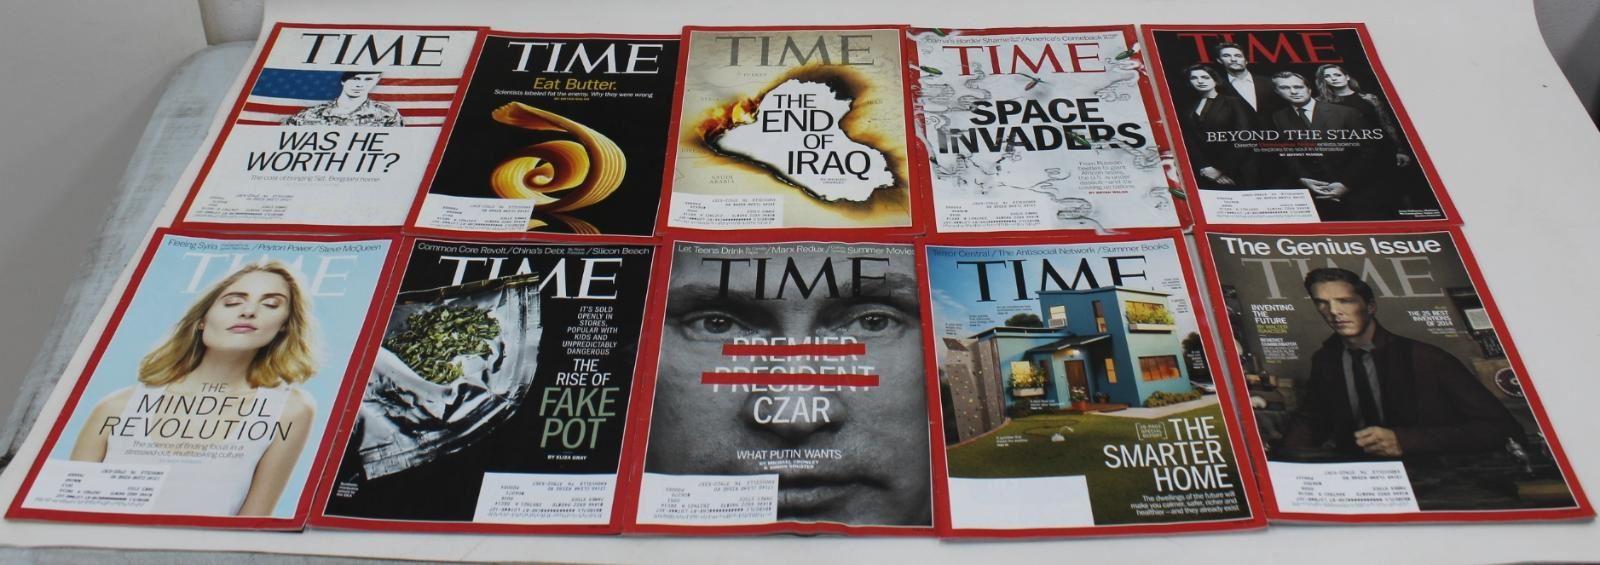 TIME-MAGAZINE-2014-Lot-Of-10-Pot-Putin-Bergdahl-Butter-Homes-Iraq-Space-Genius